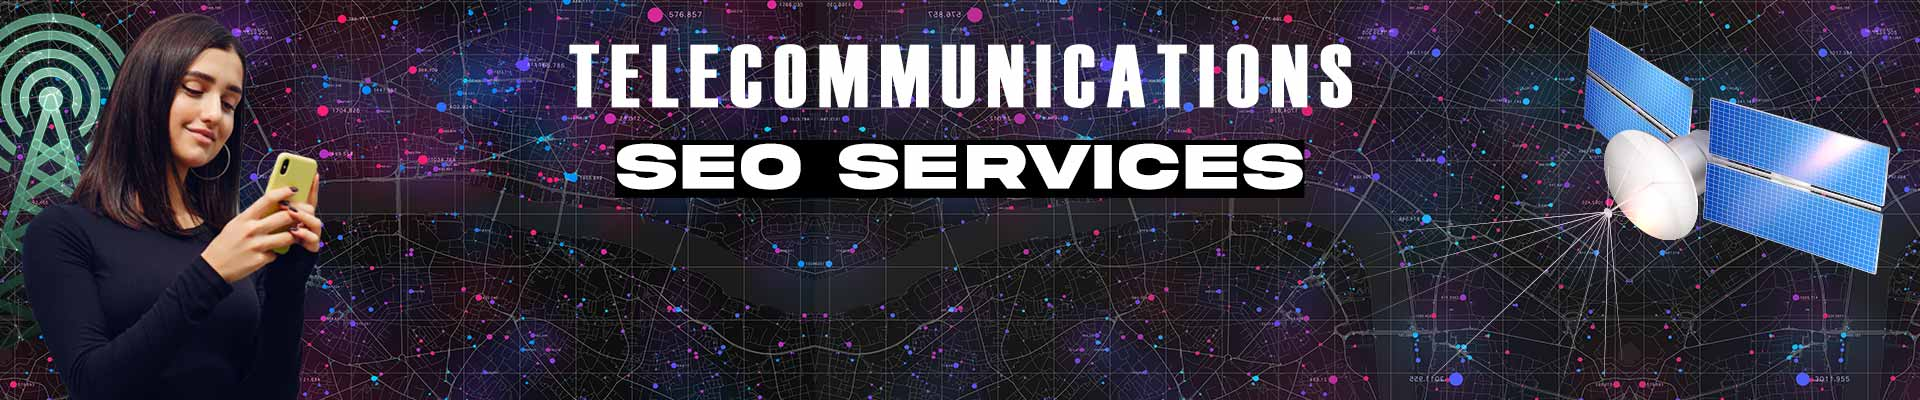 Best Telecommunications SEO Company